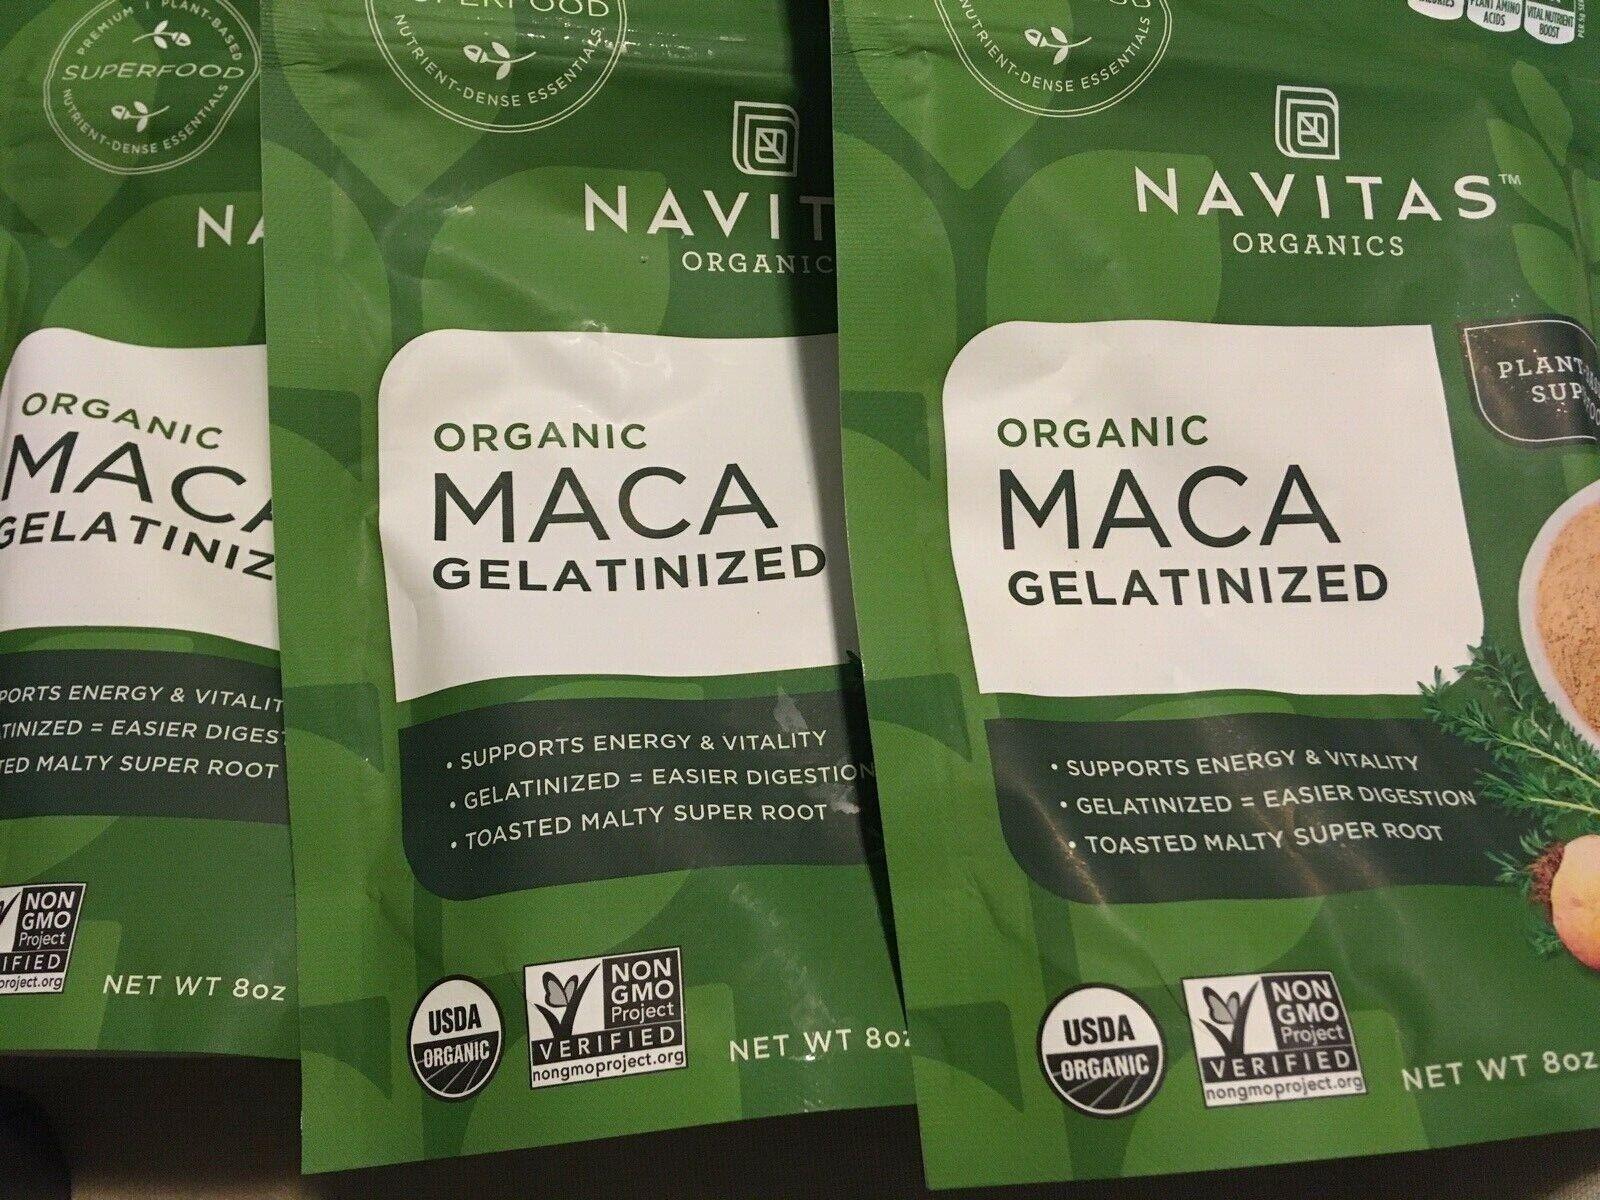 Navitas Naturals Organic Gelatinized Maca Powder, 8 Ounce --